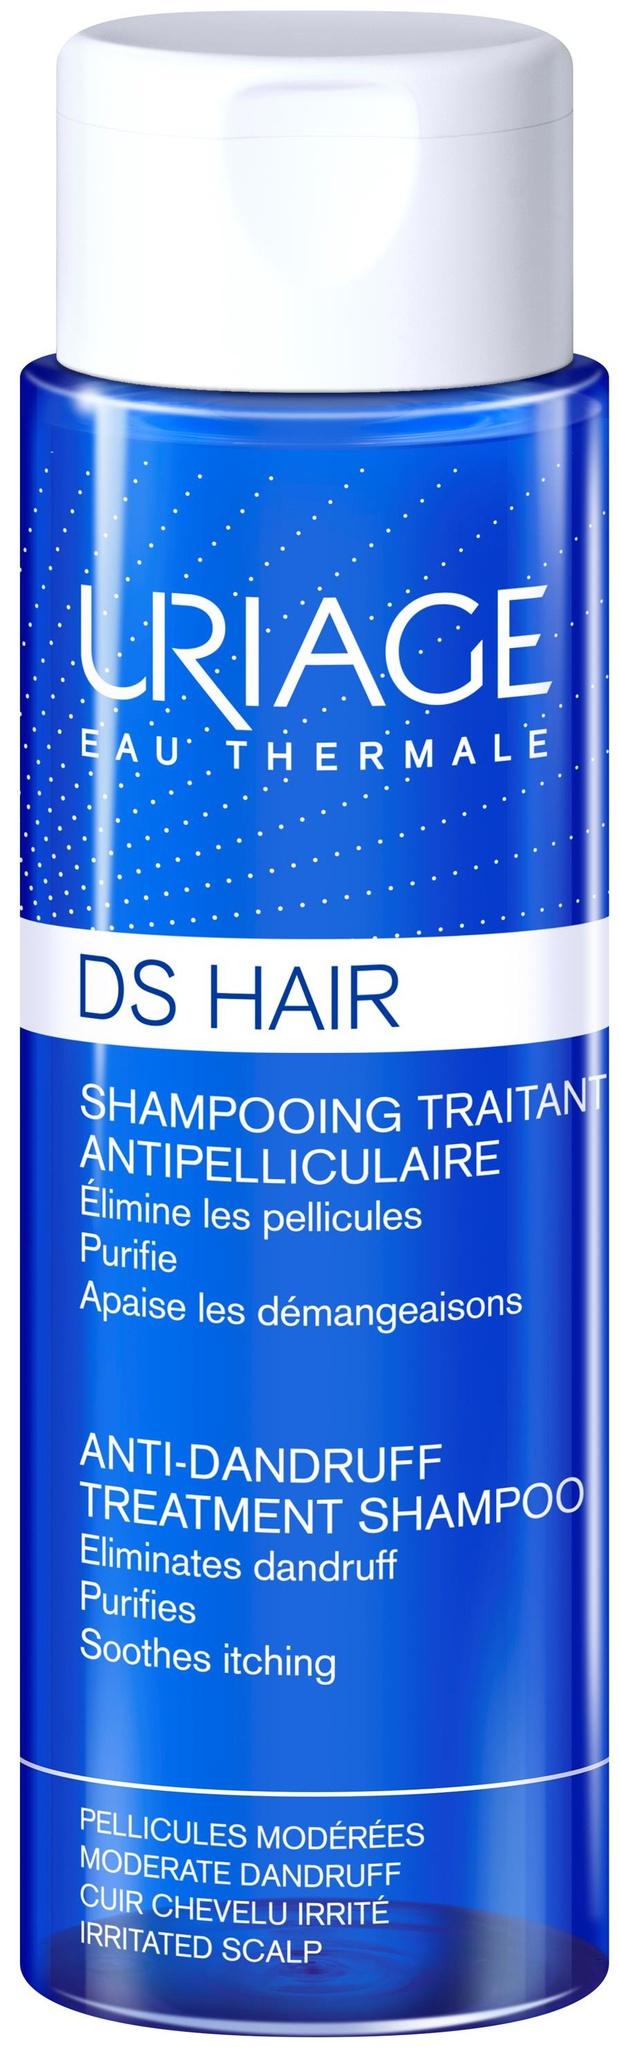 Uriage DS Hair Anti-dandruff Treatment Shampoo